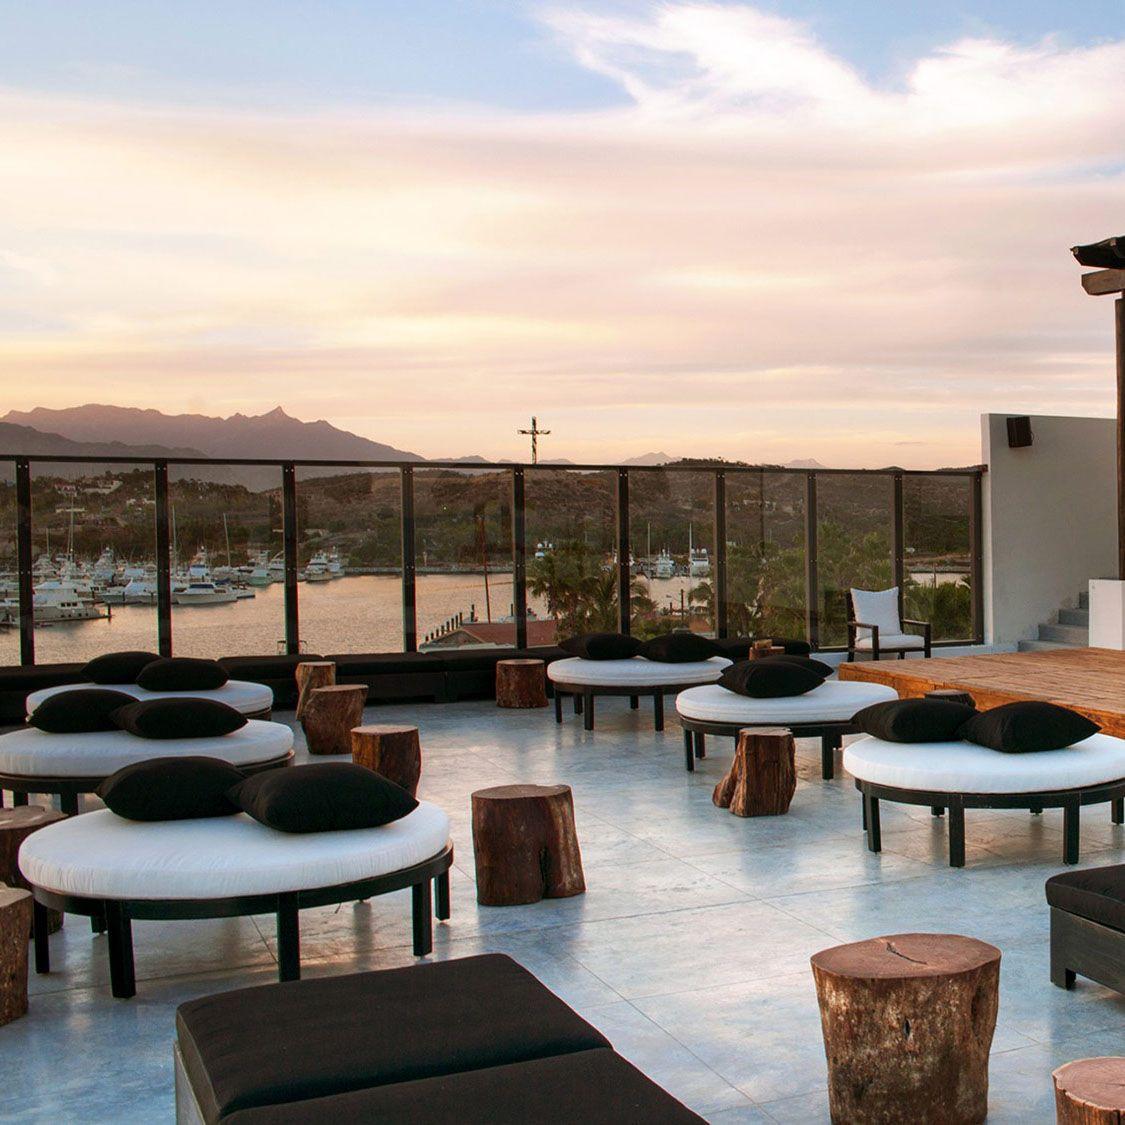 Rooftop Living Room With Sea View Hotel El Ganzo Vossy Com Hotel San Jose Del Cabo